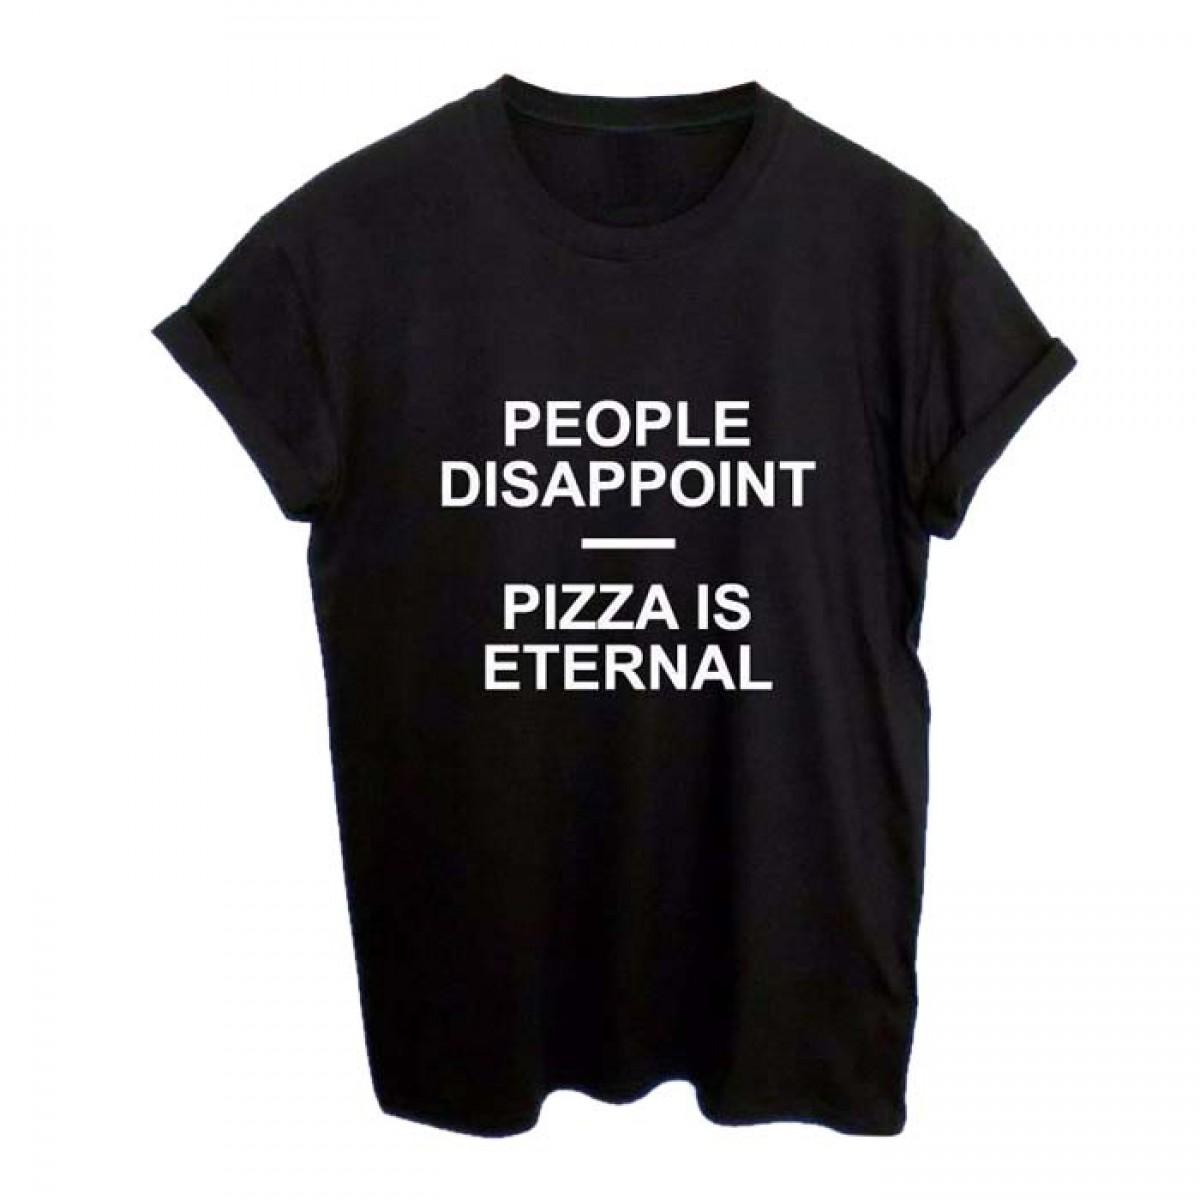 Black t shirt grunge - People Disappoint Pizza Is Eternal Grunge Rebel Black Tshirt